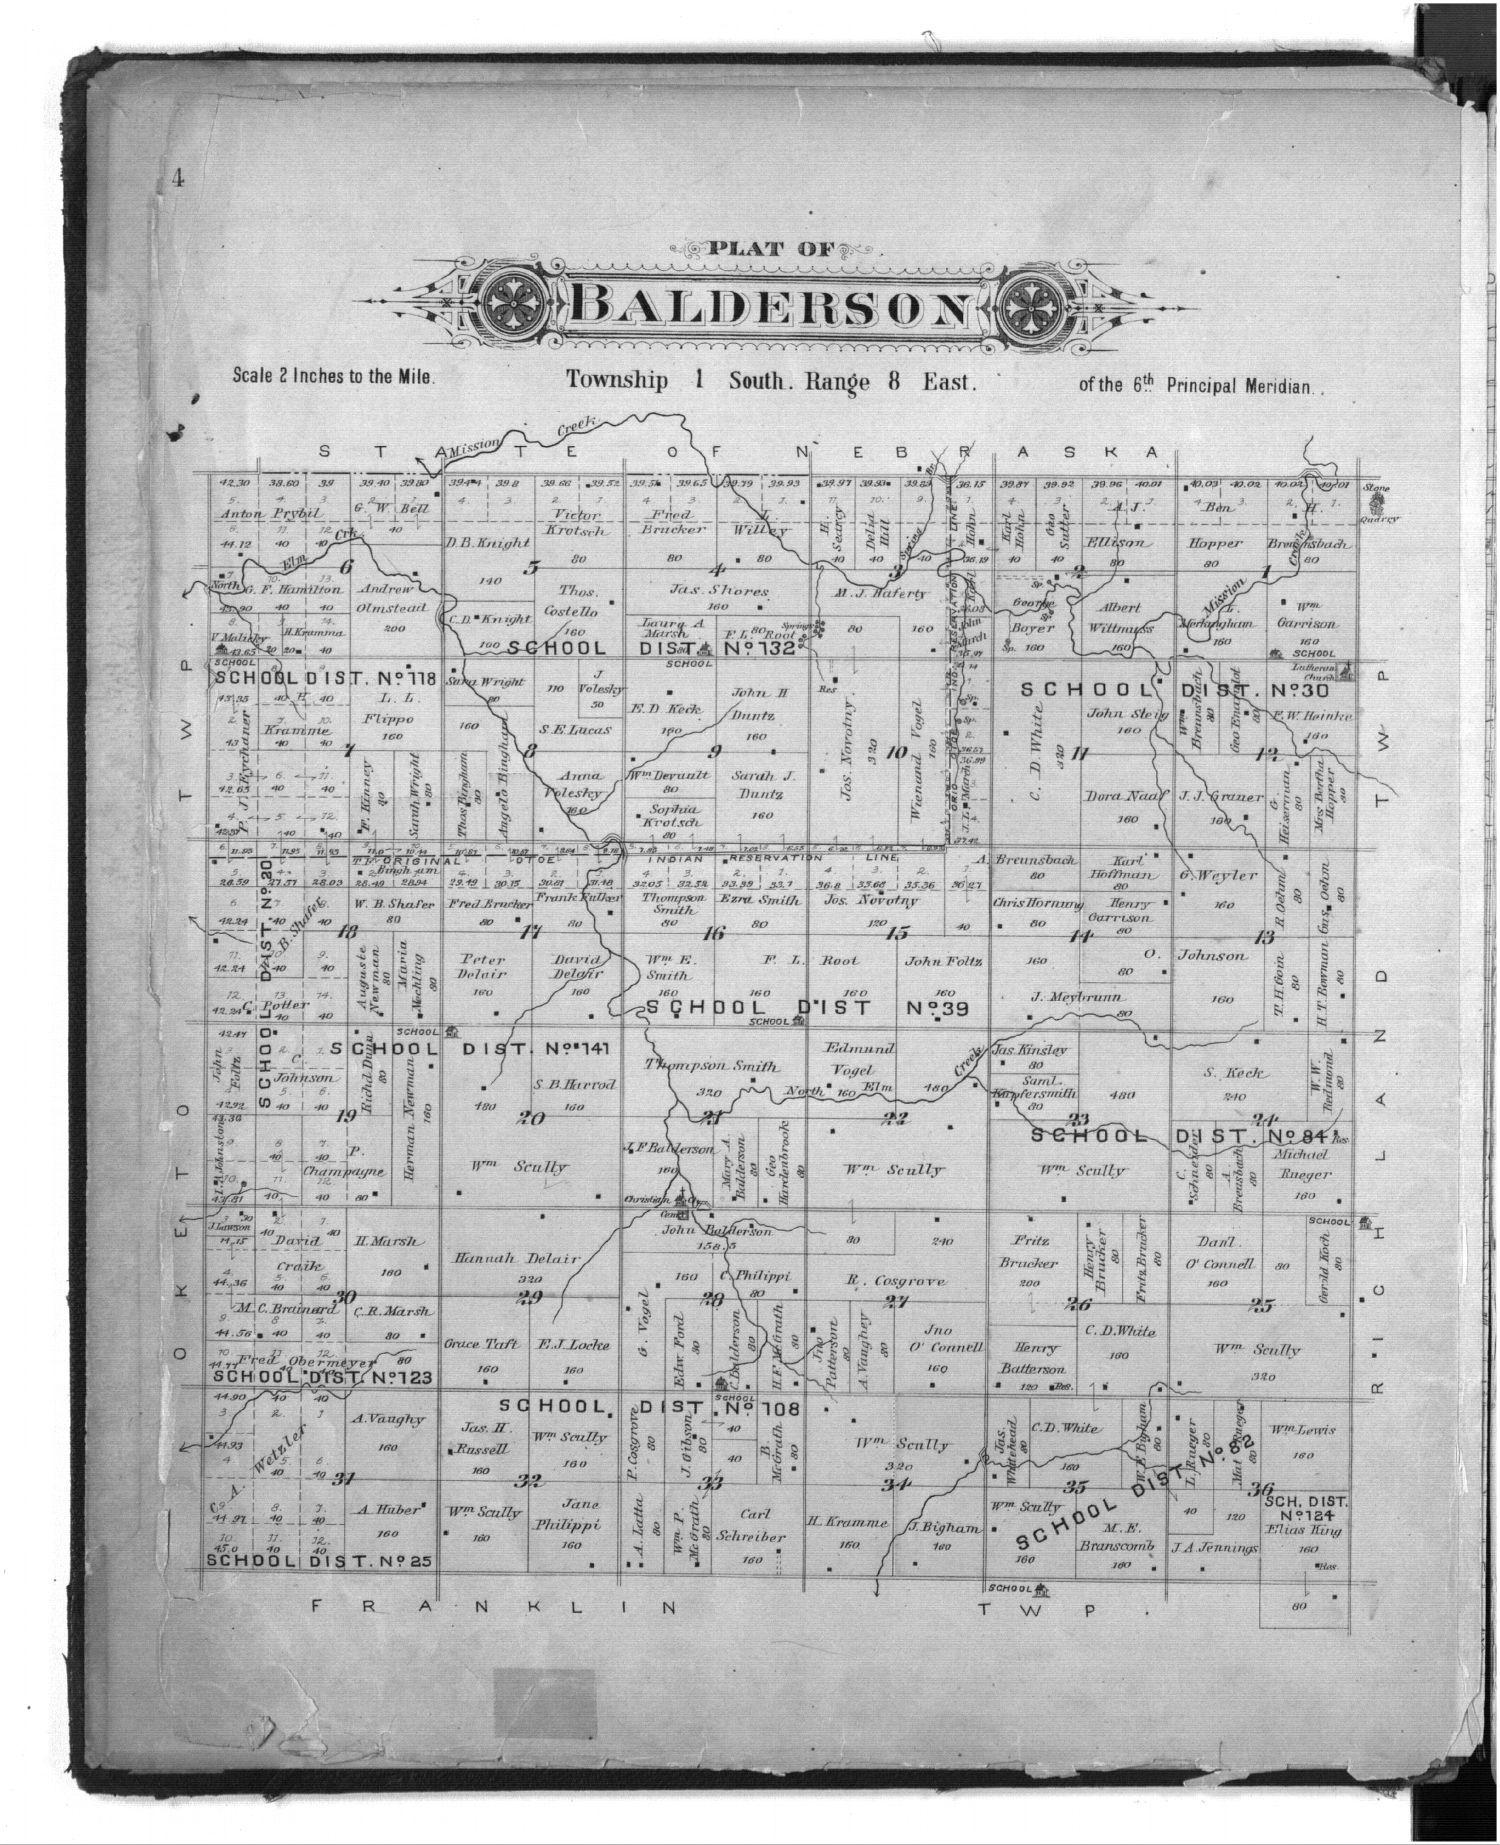 Plat book of Marshall County, Kansas - 4